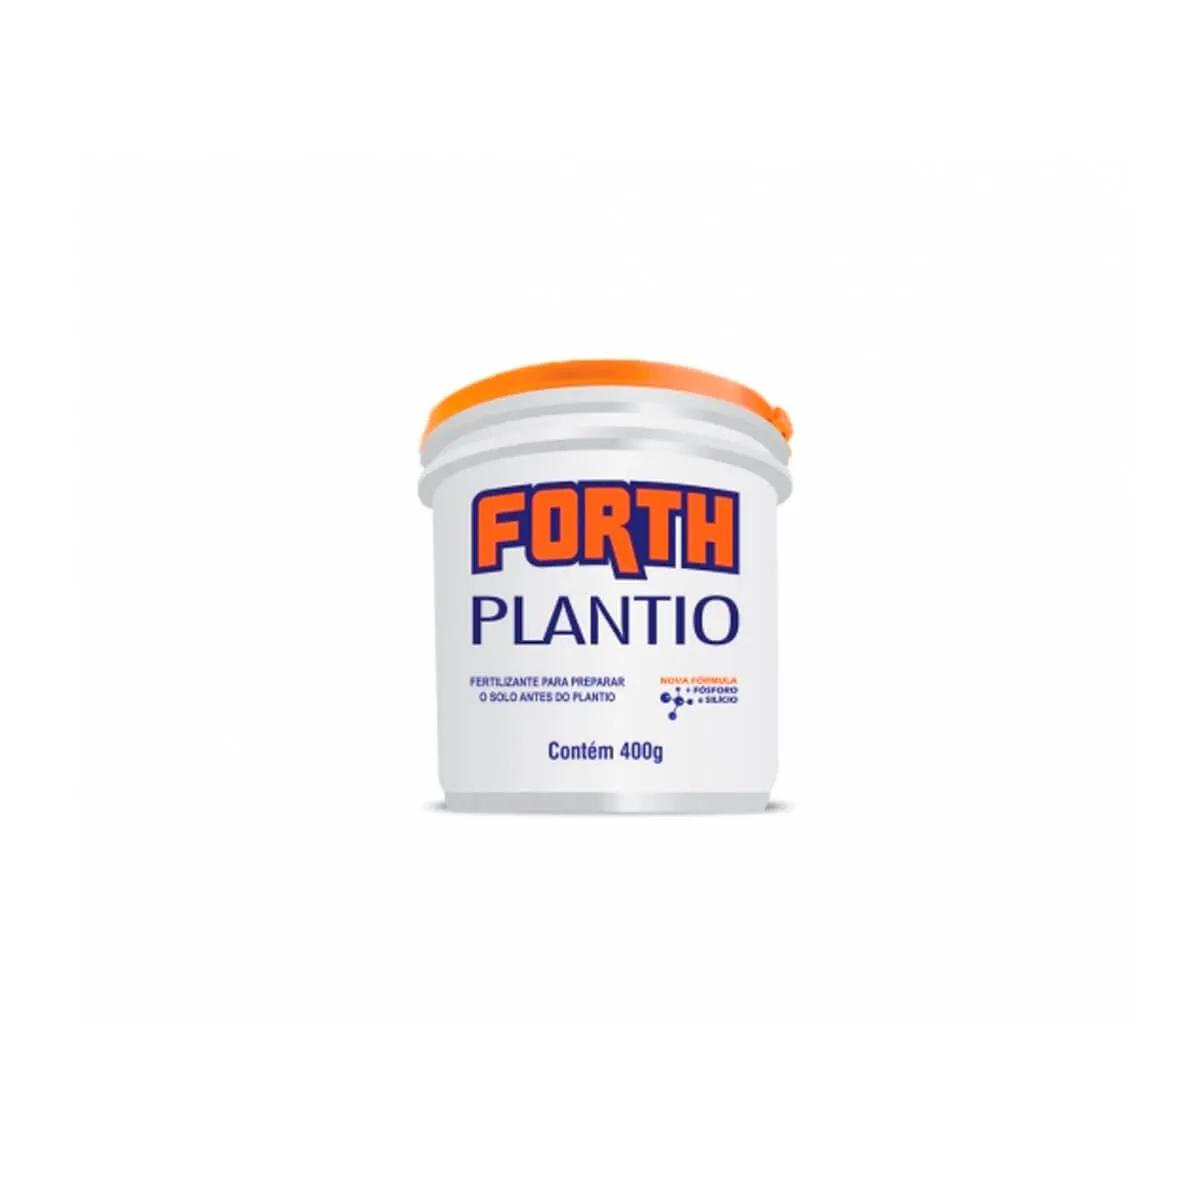 Fertilizante para plantas Forth Plantio 400g  - Vasos Raiz Loja Oficial